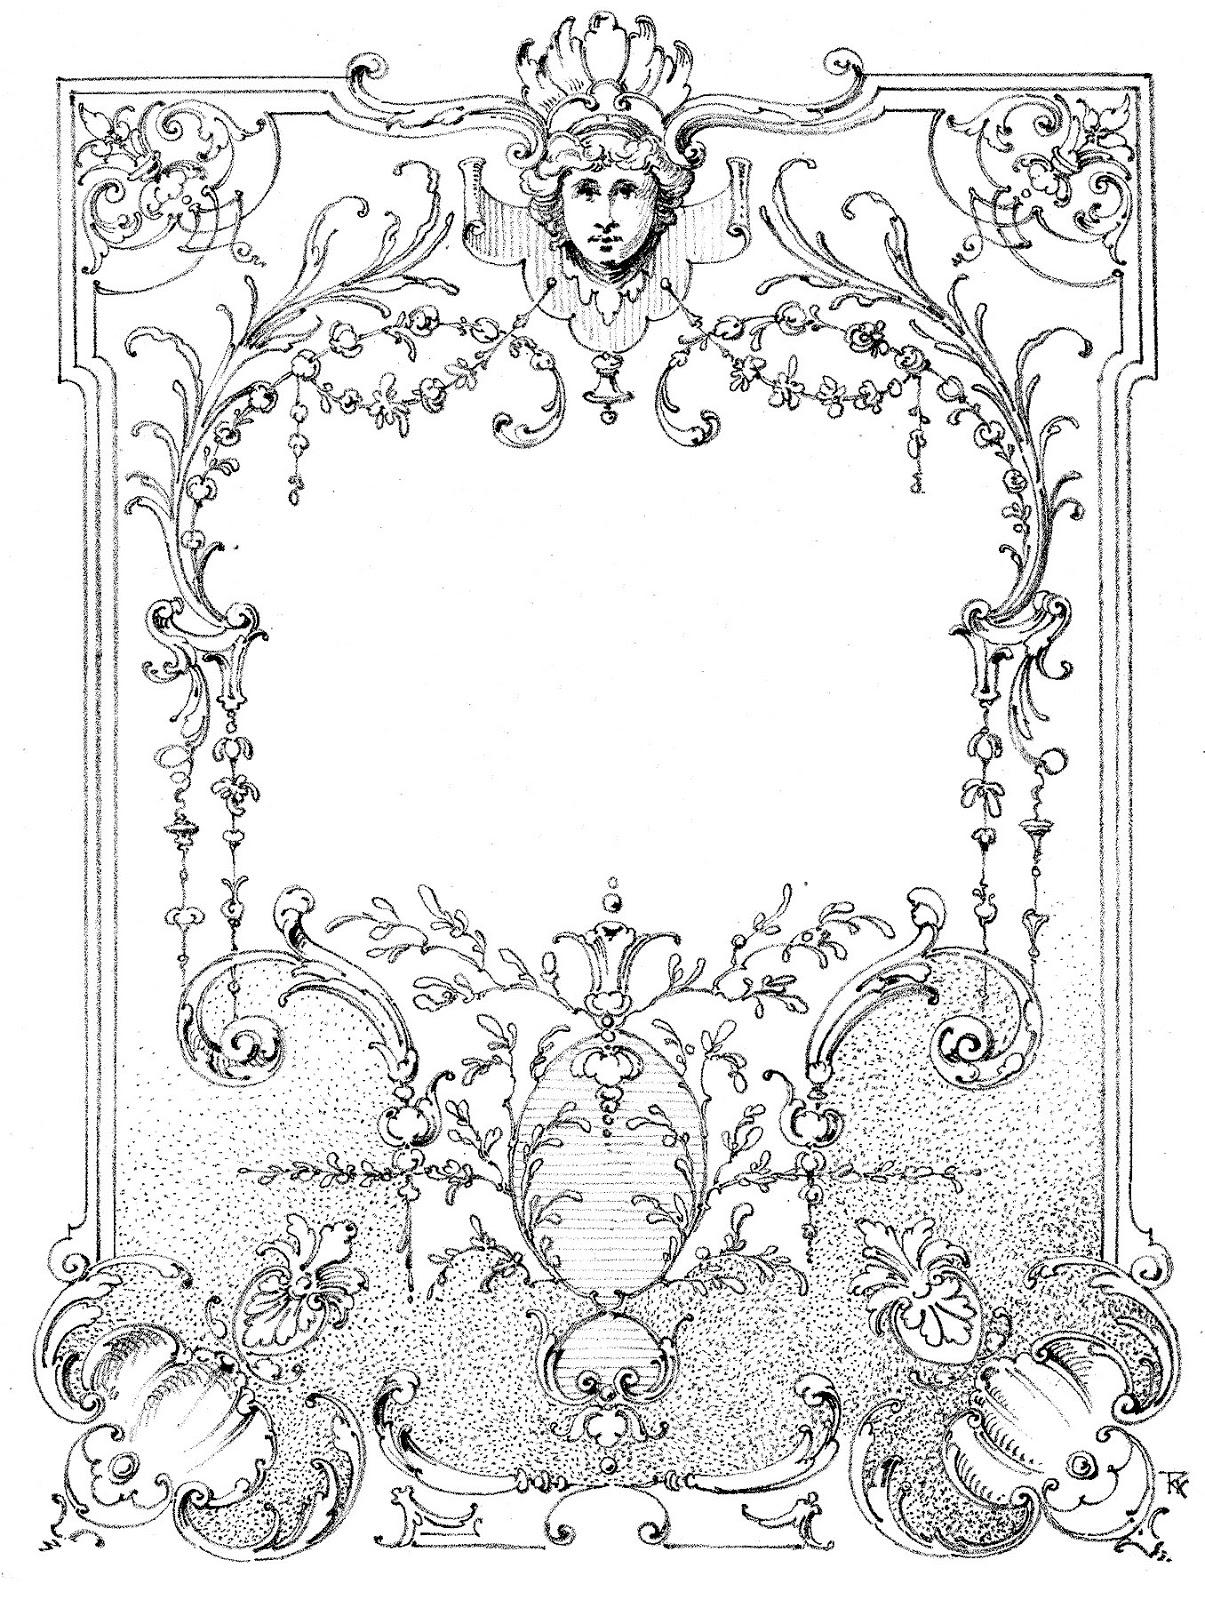 Vintage Illustrations - Gorgeous Ornate Label - Frame - The Graphics ...